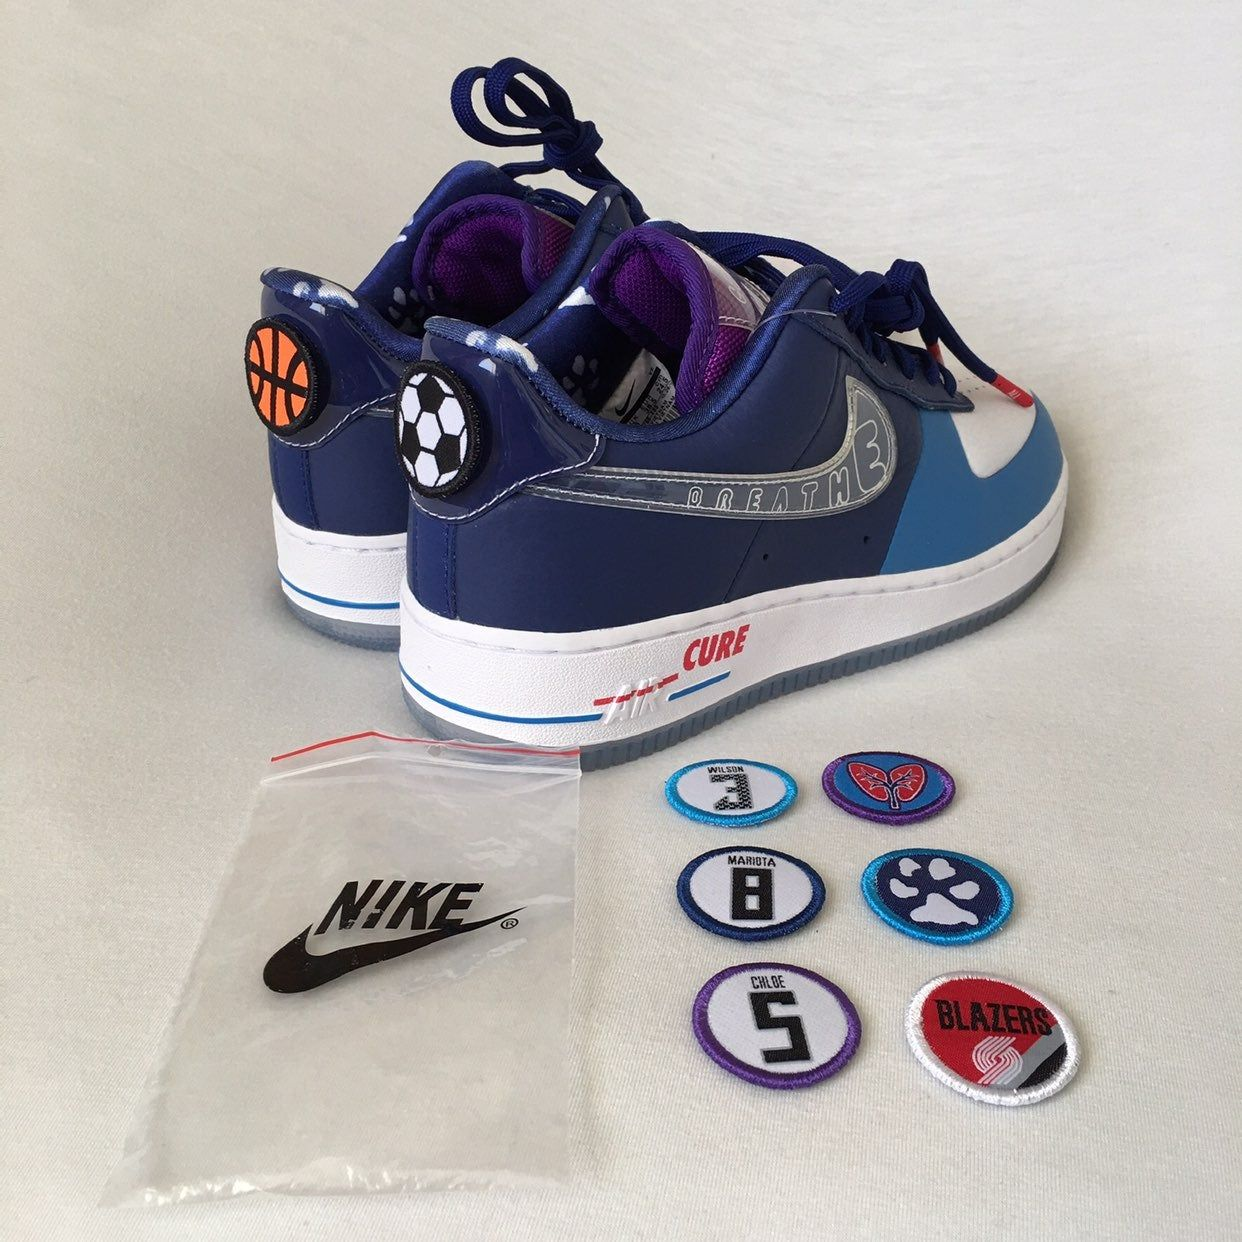 Nike Air Force 1 Low Doernbecher